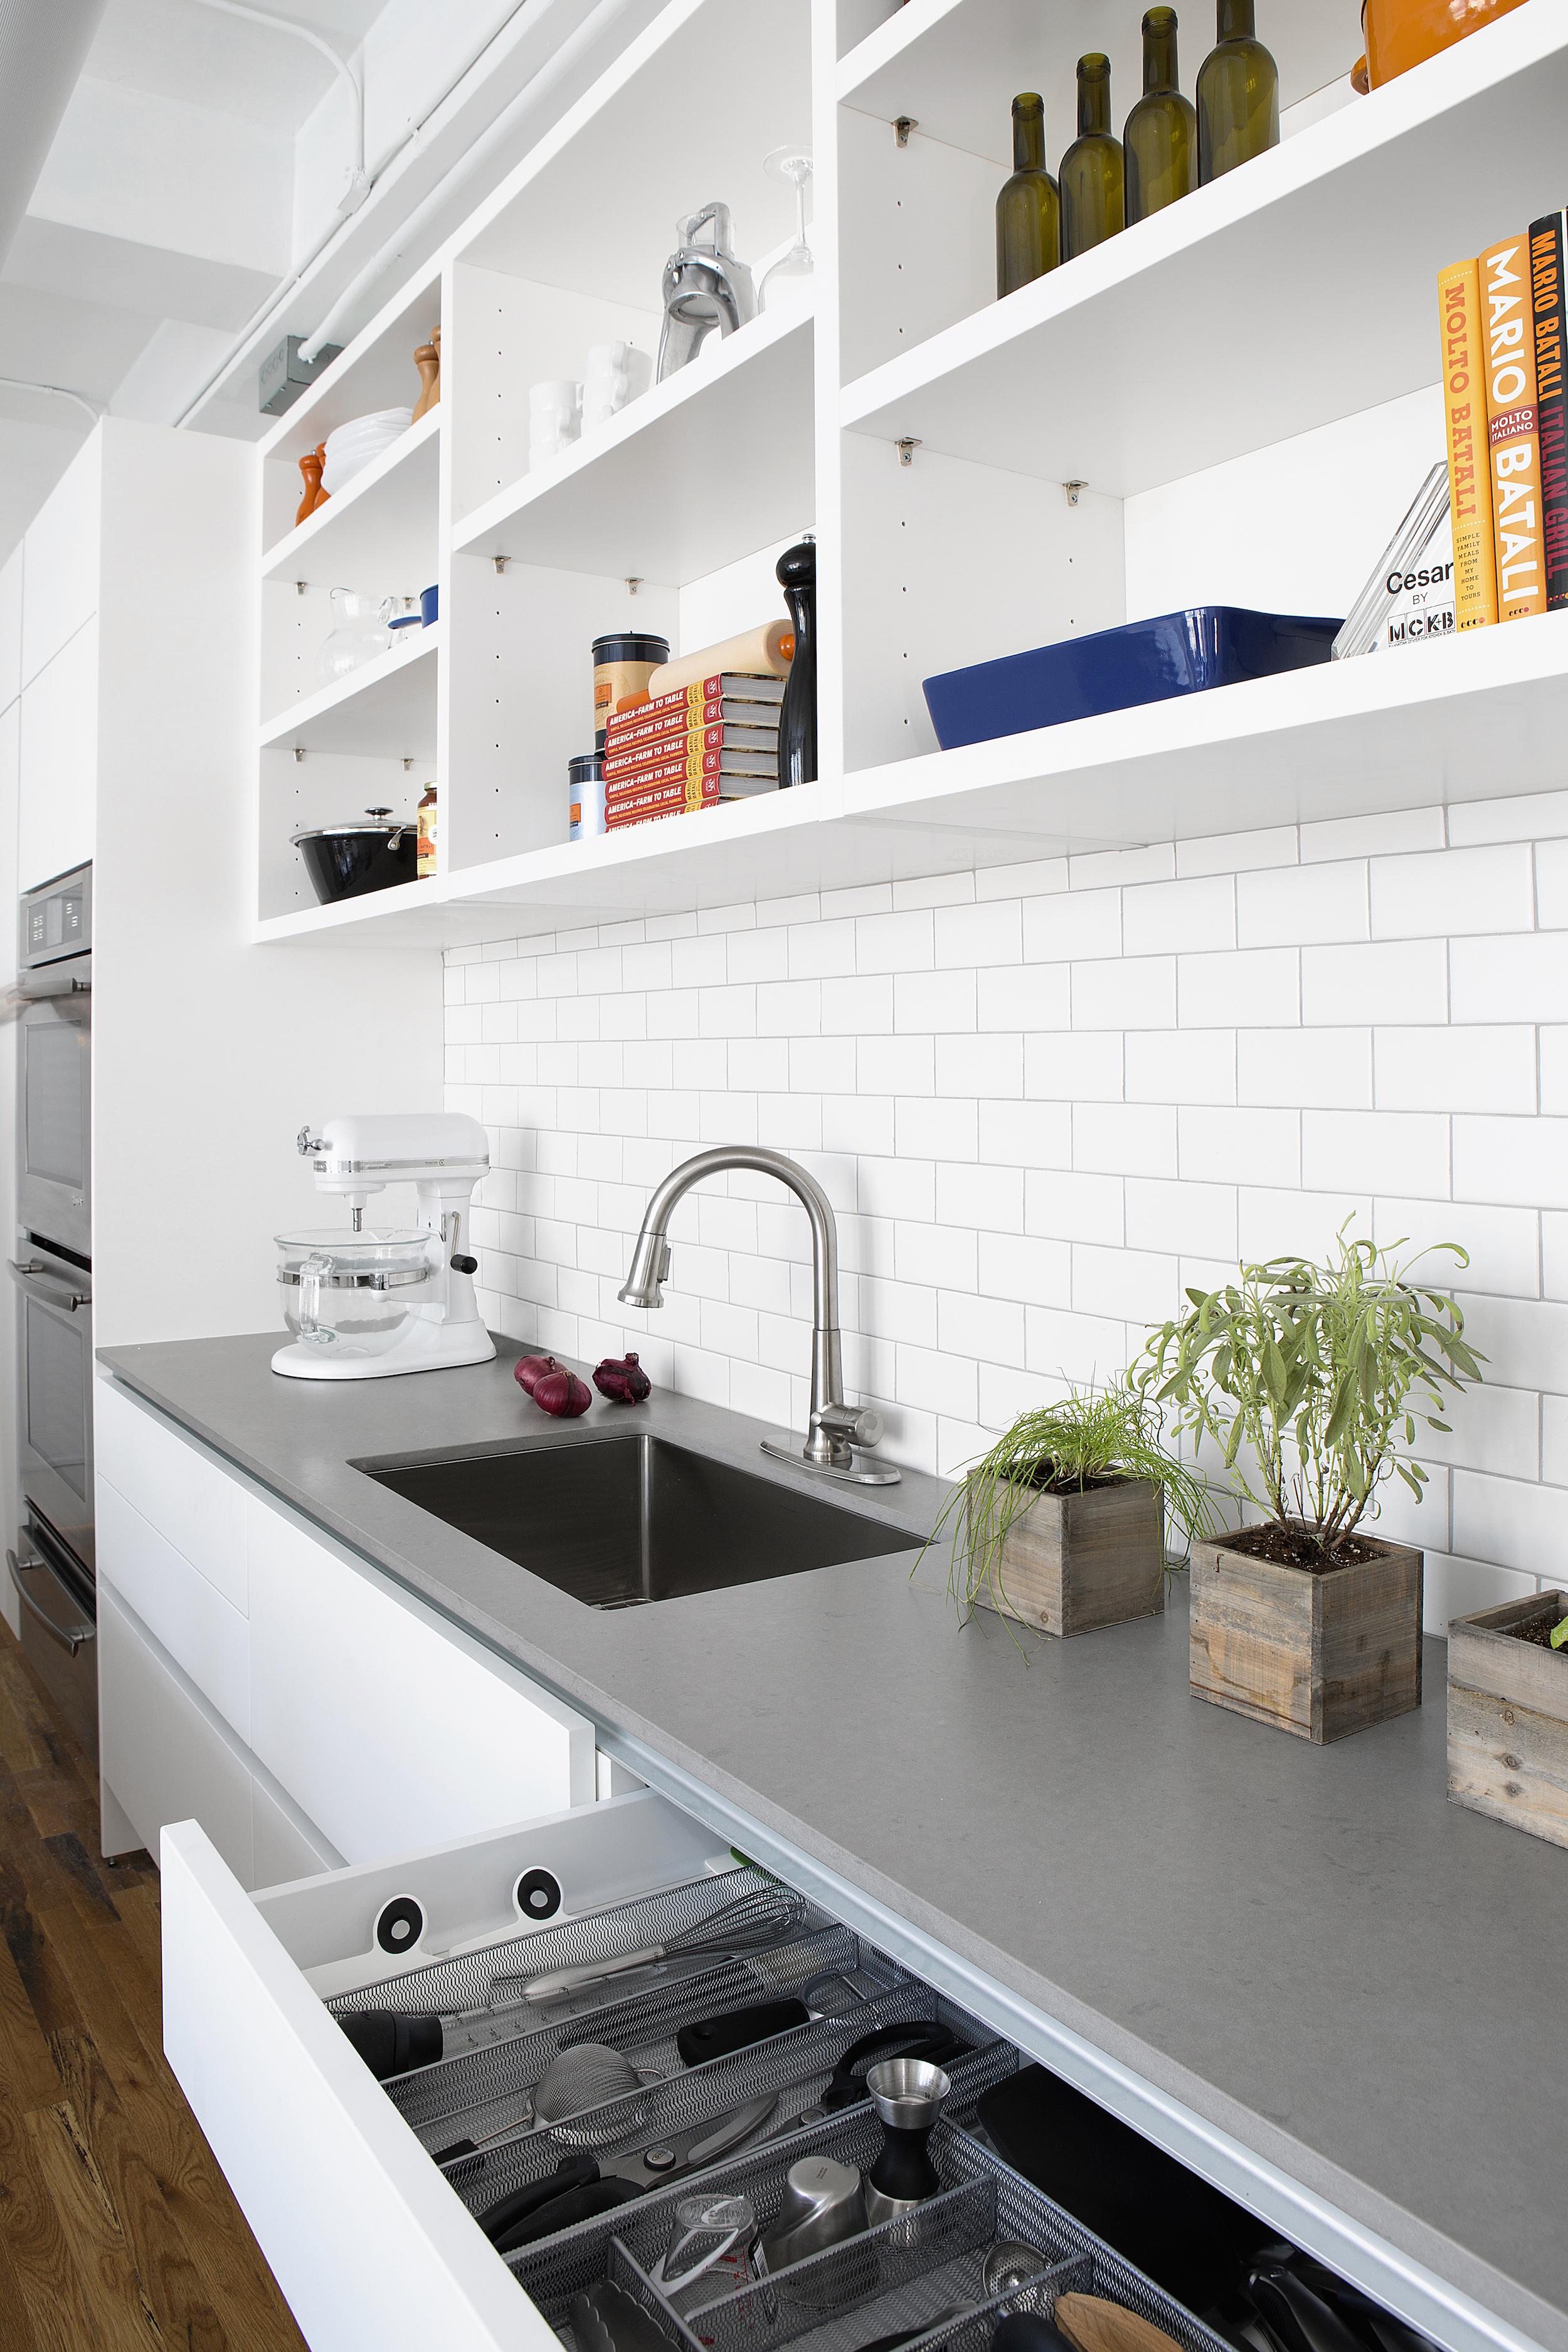 Manhattan Center For Kitchen And Bath Reviews